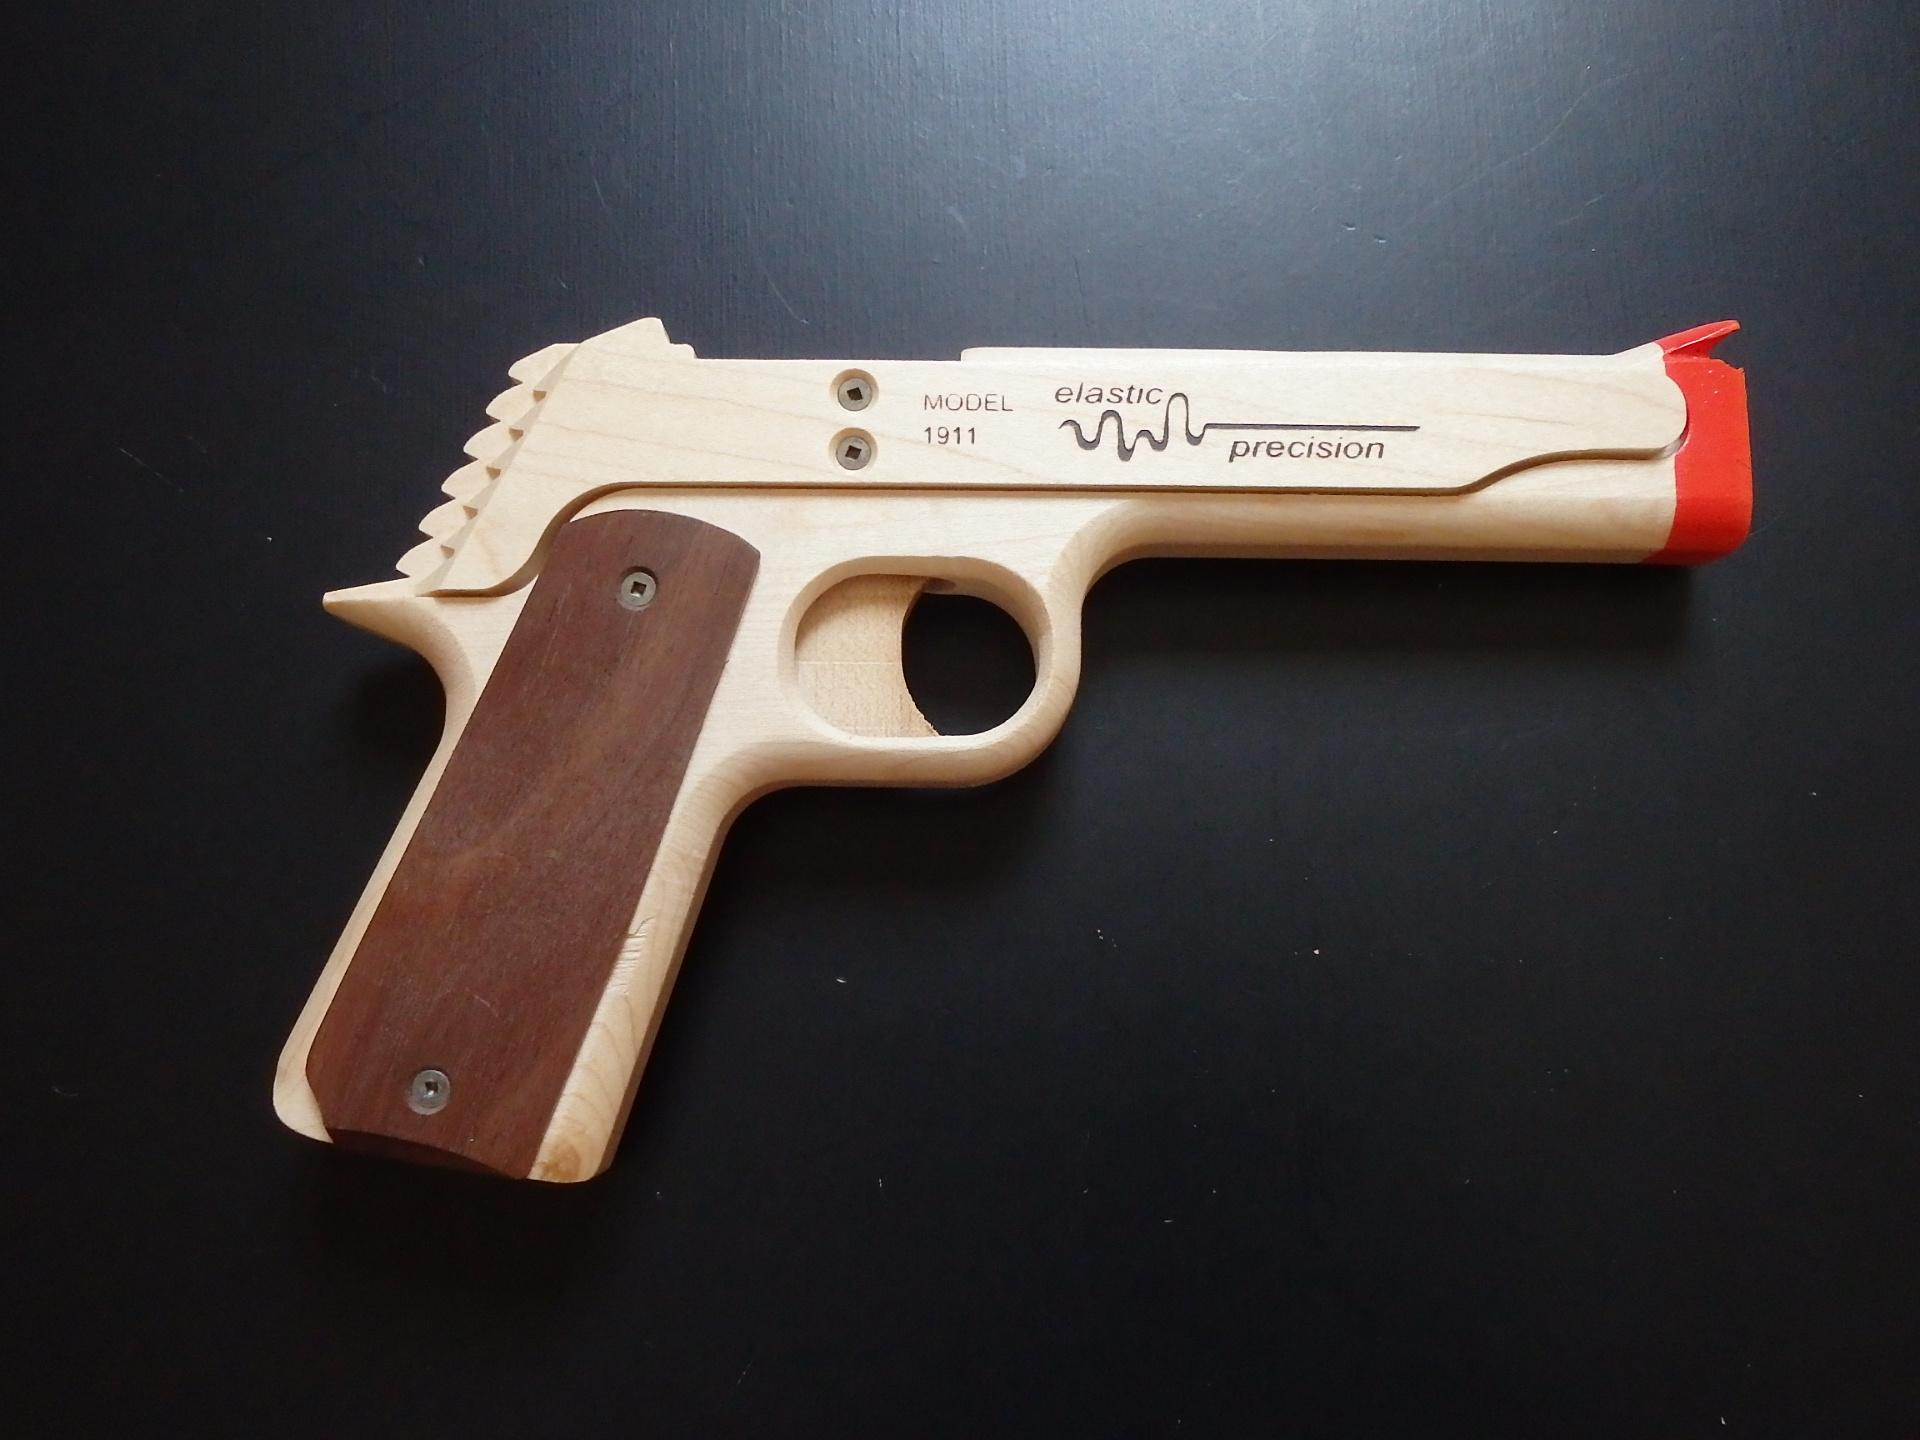 ELASTIC PRECISION MODEL 1911 RUBBER BAND GUN